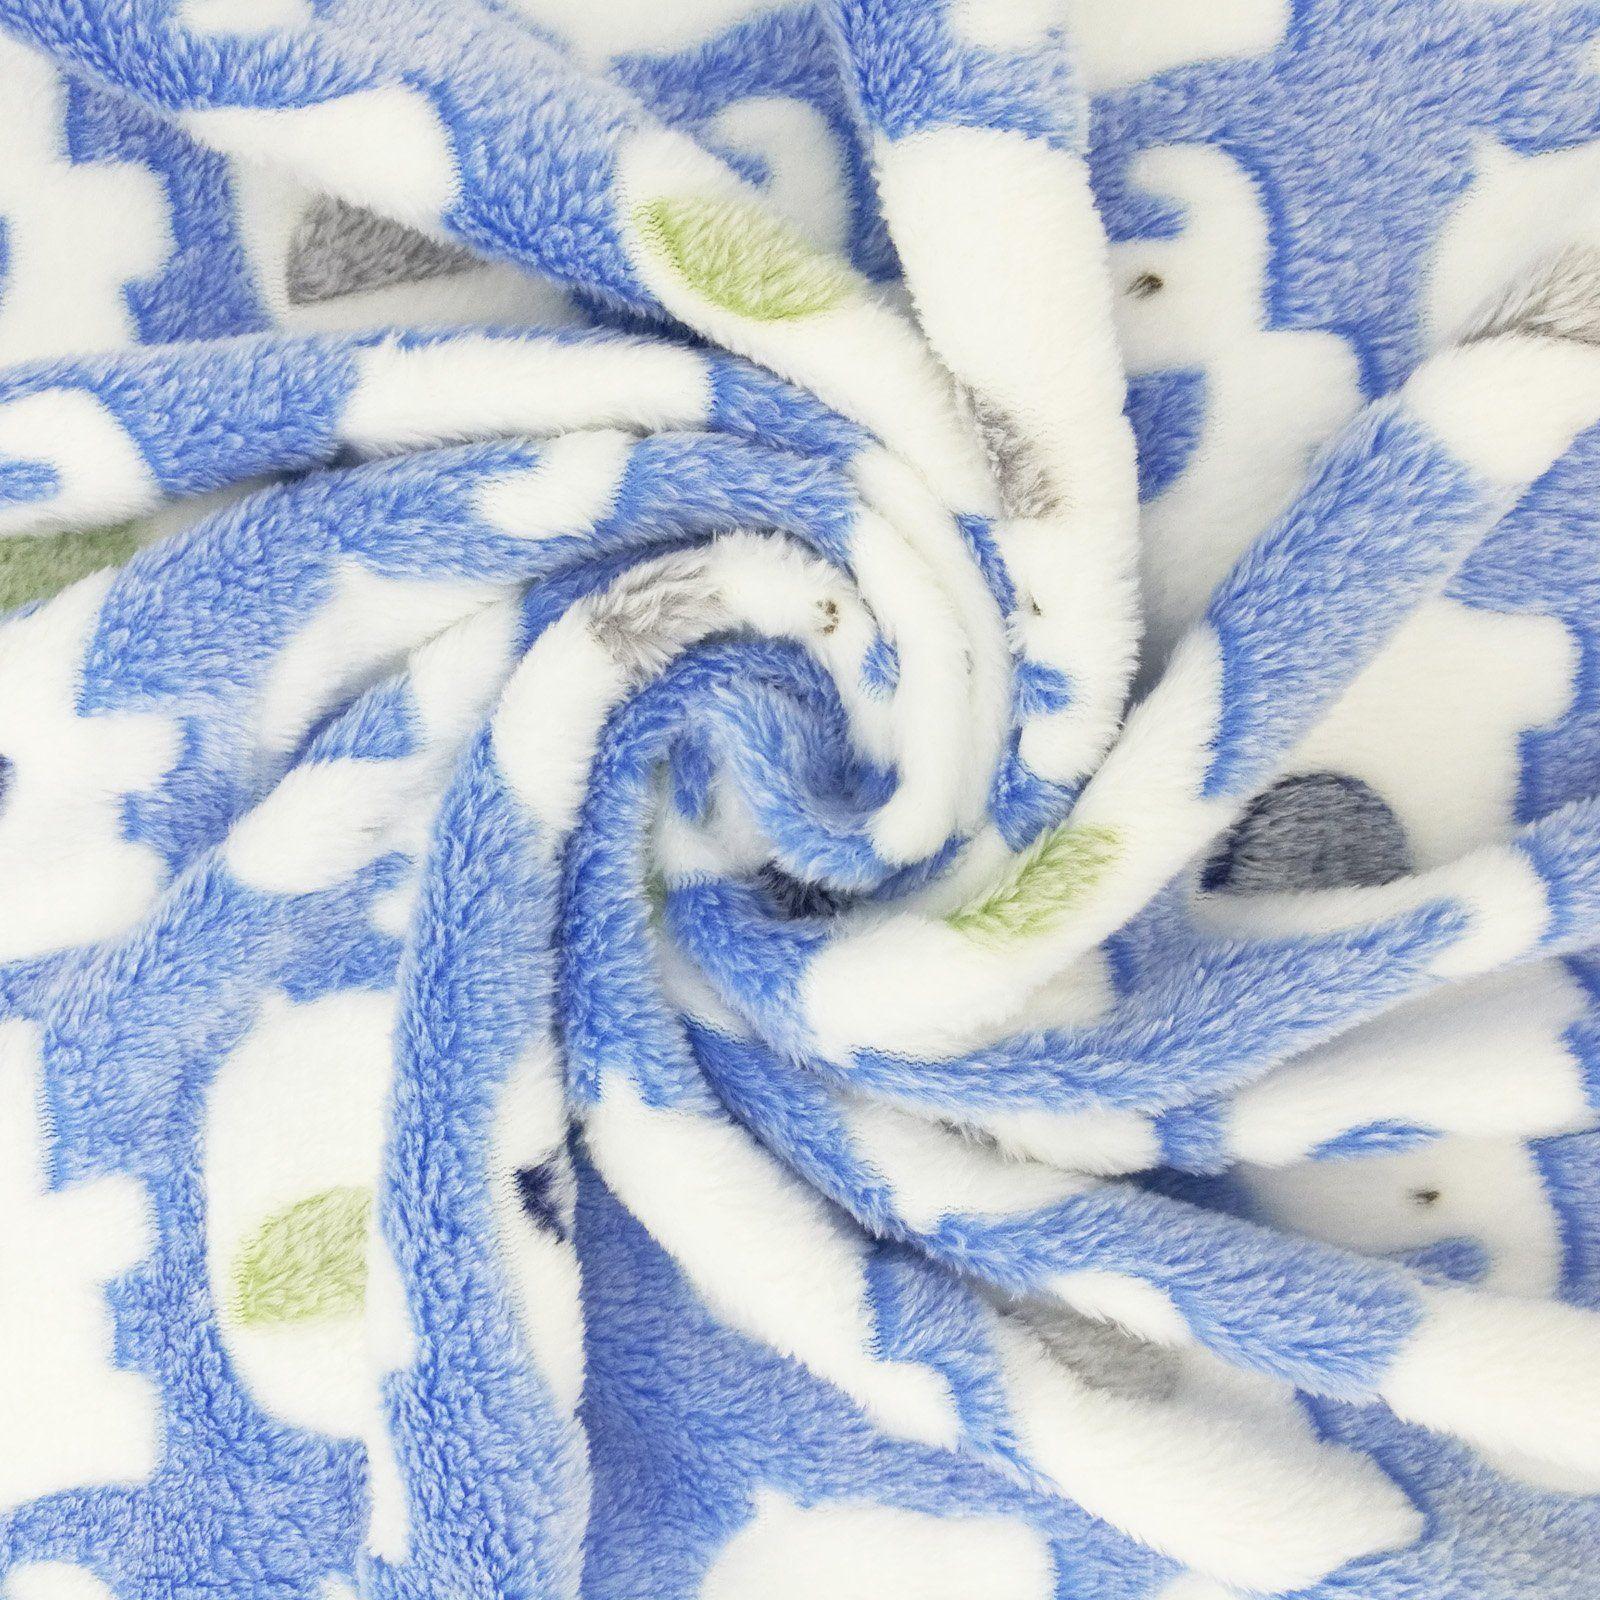 3 Packs 3 Colors 23 X 15 5 Small Blanket Soft Warm Fleece Throw Blanket Pet Kitten Blanket Fleece Puppy Blanket Cushion Ul Puppy Blanket Pet Kitten Cat Carrier